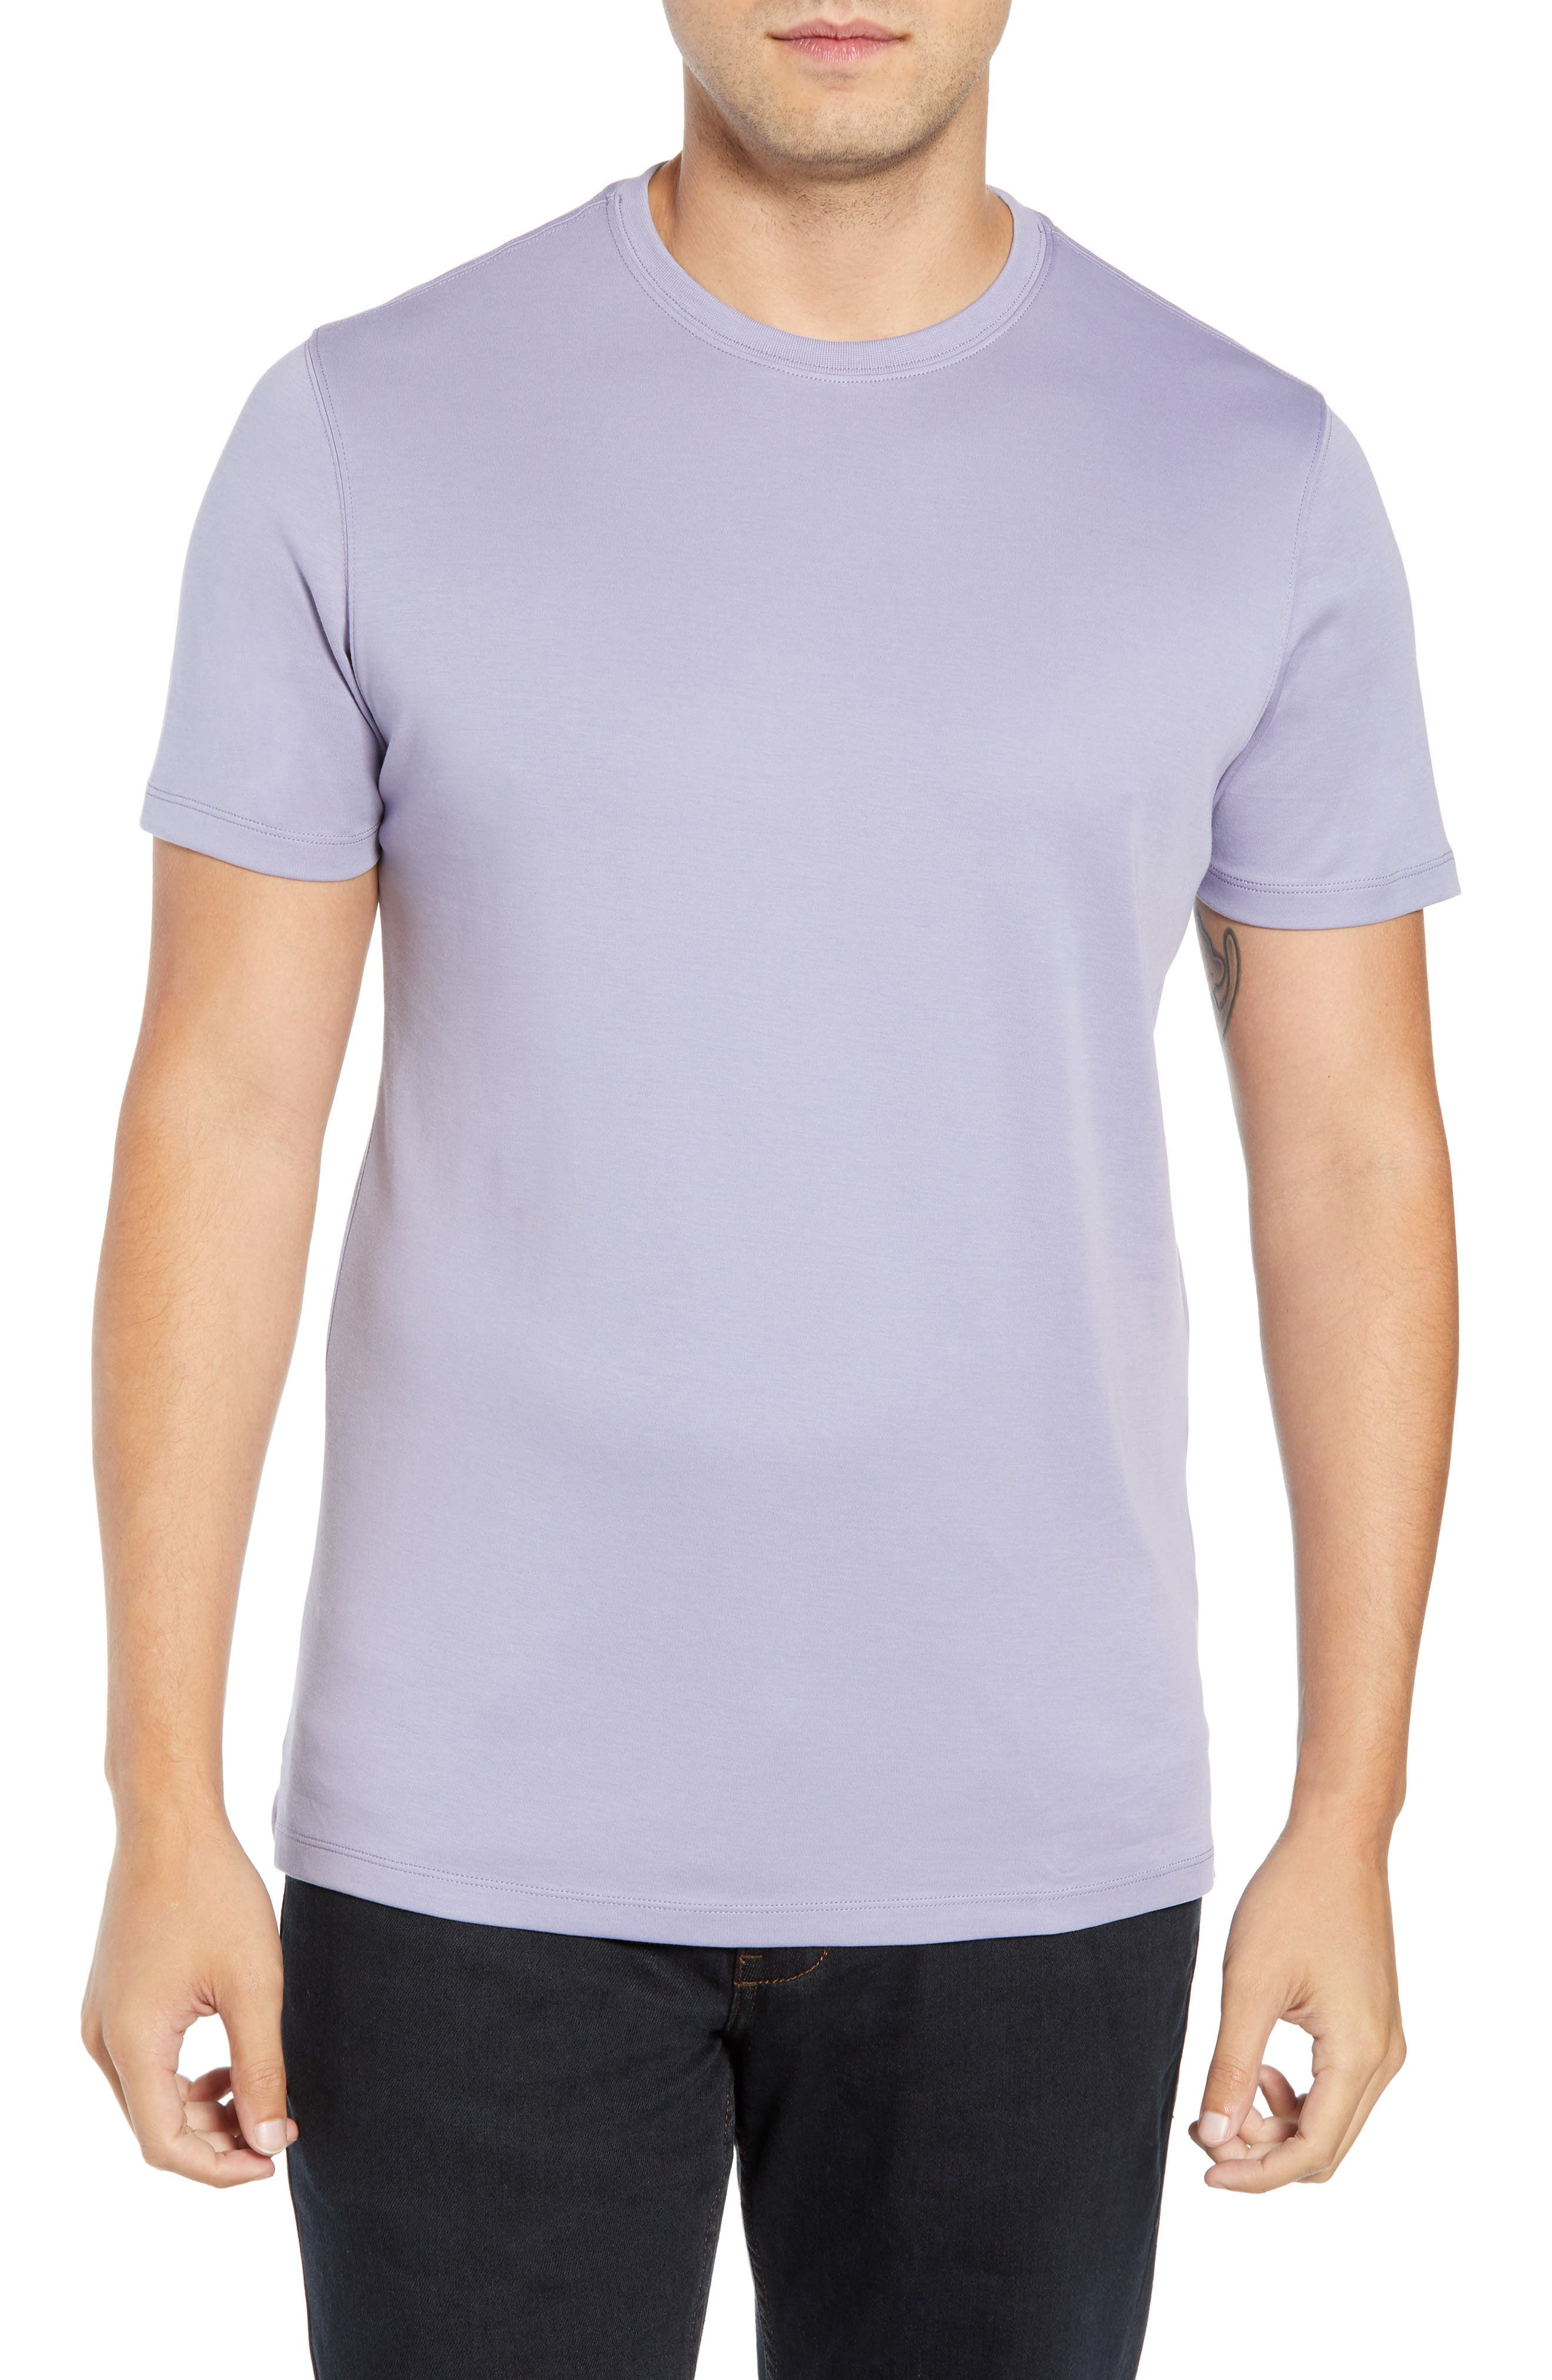 e8bfa2c93cdd Crewneck T-Shirts for Men  Long   Short Sleeves